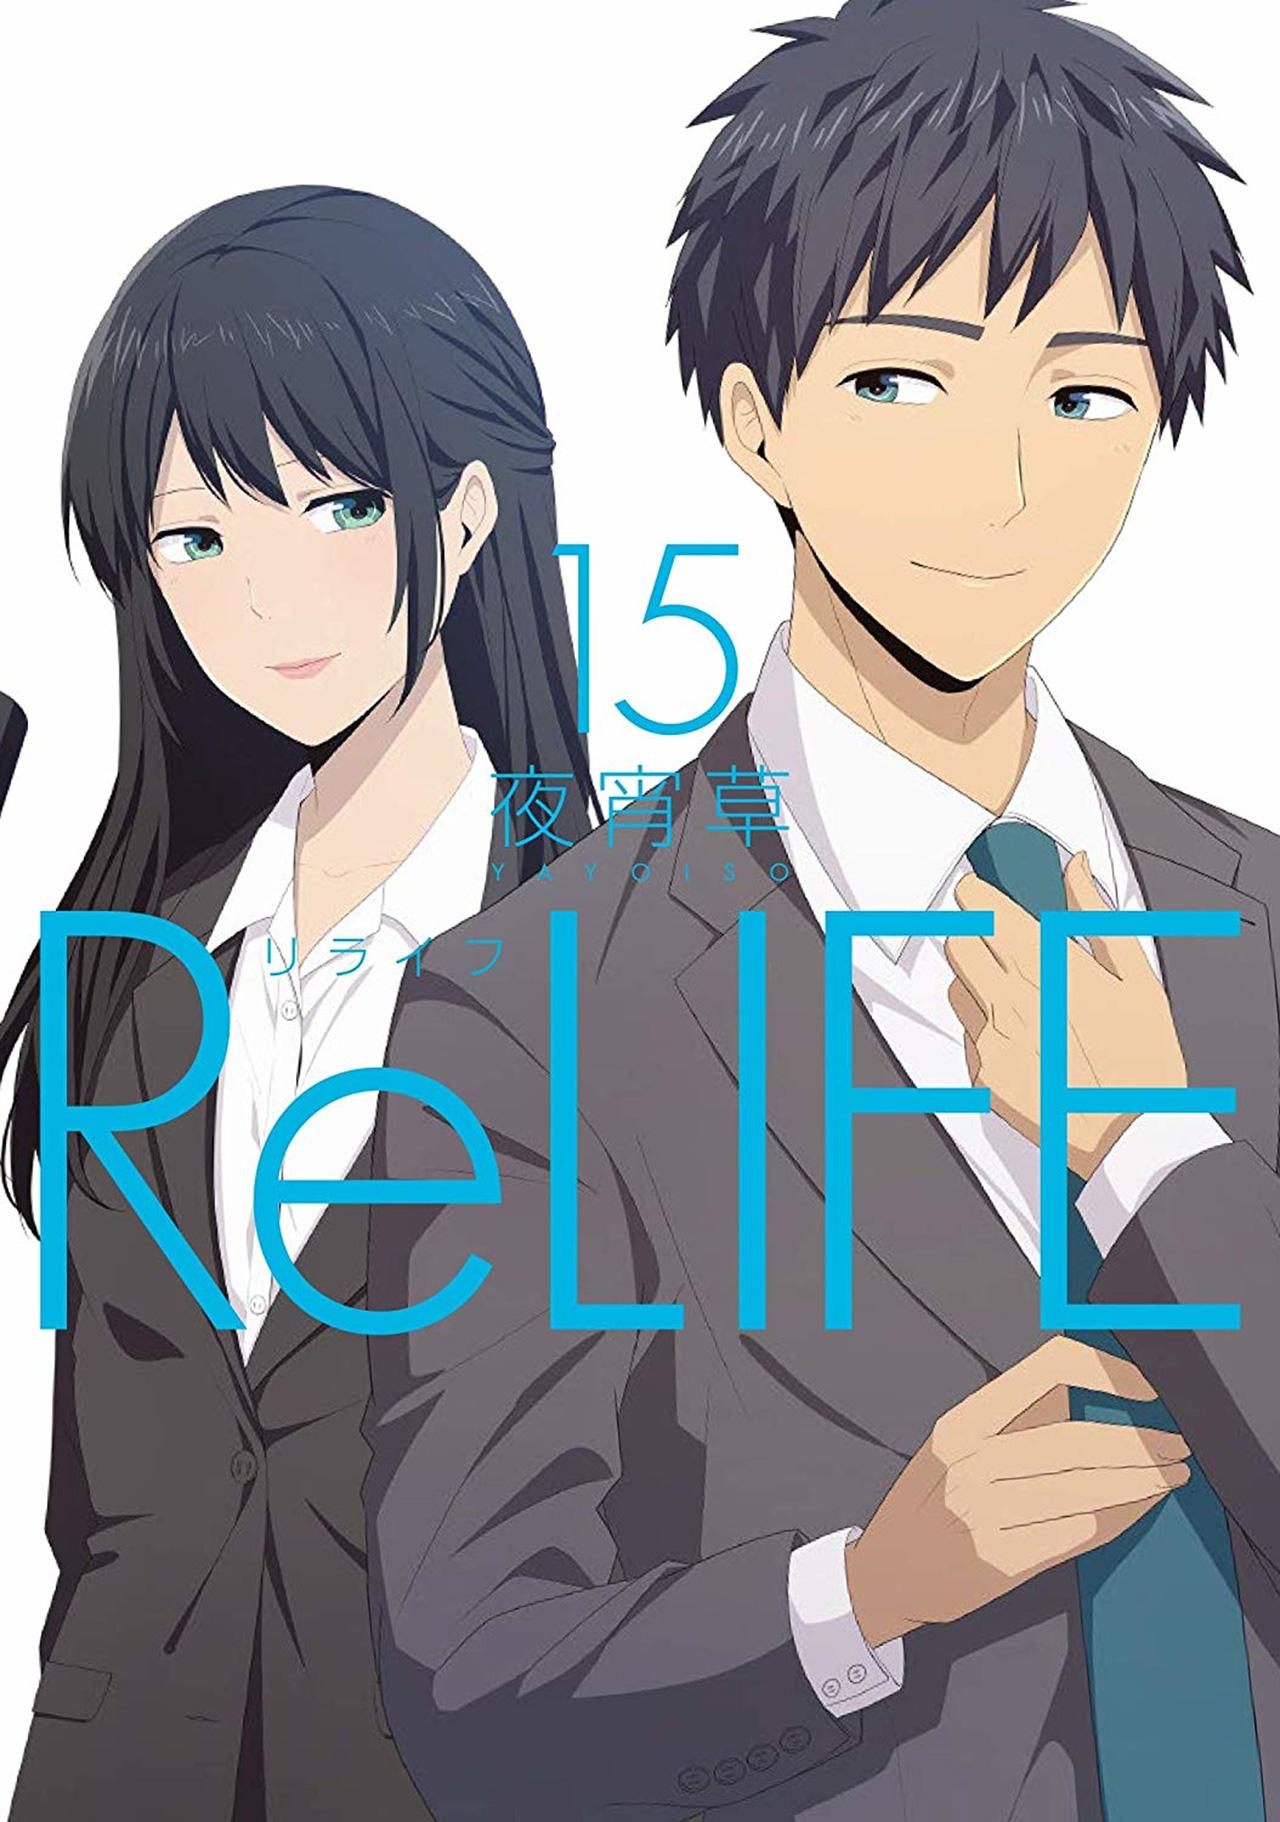 Capa do volume 15 do mangá ReLIFE